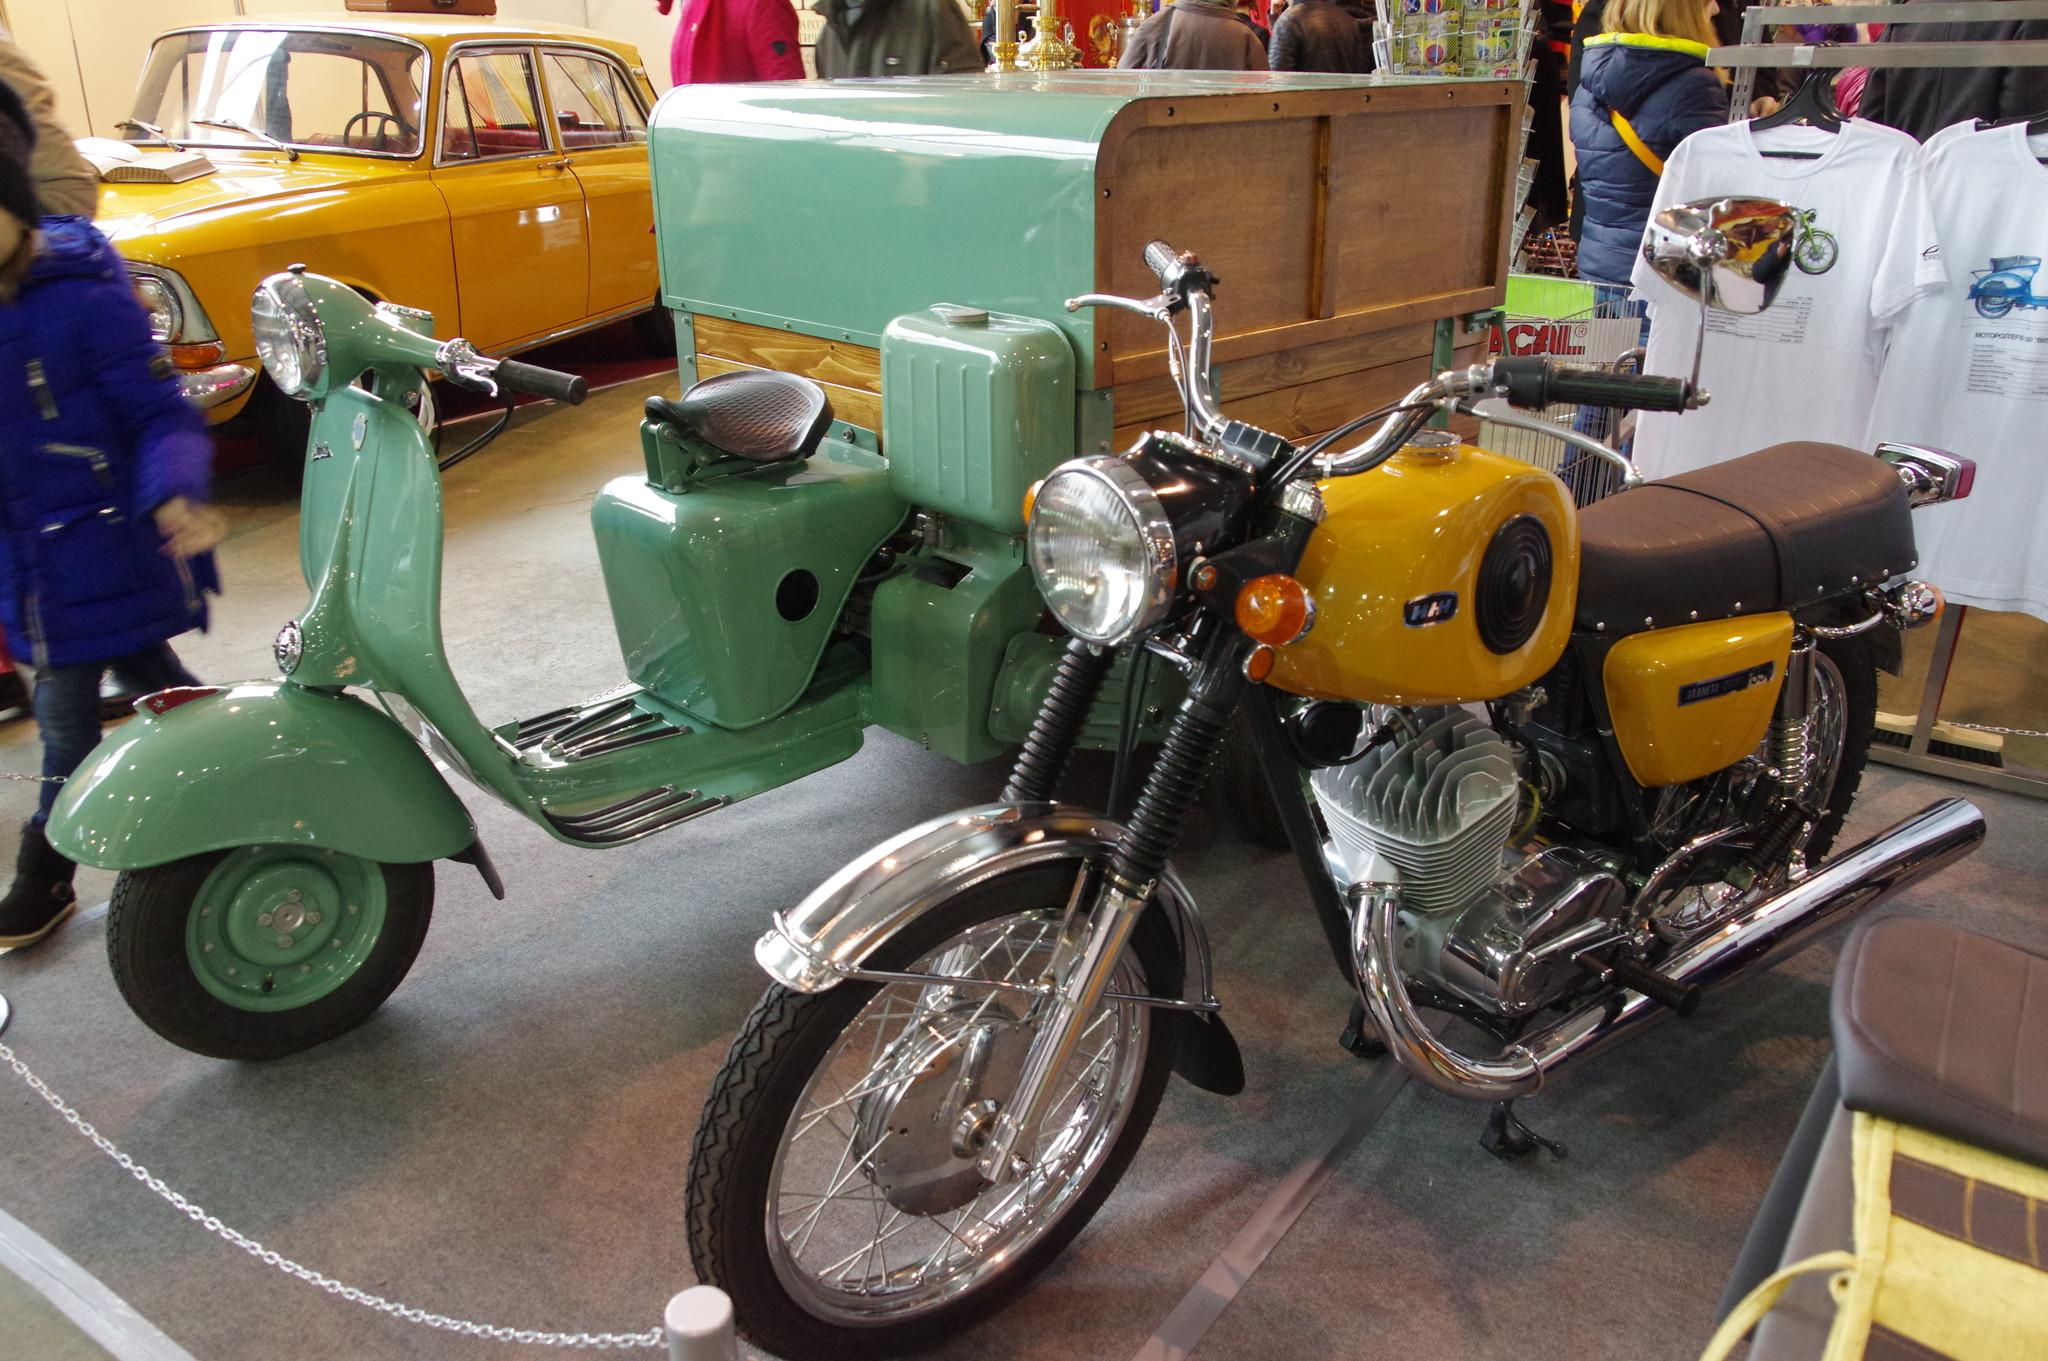 Мотоцикл «Иж Планета Спорт 350» и трёхколёсный мотороллер «Вятка МГ-150»